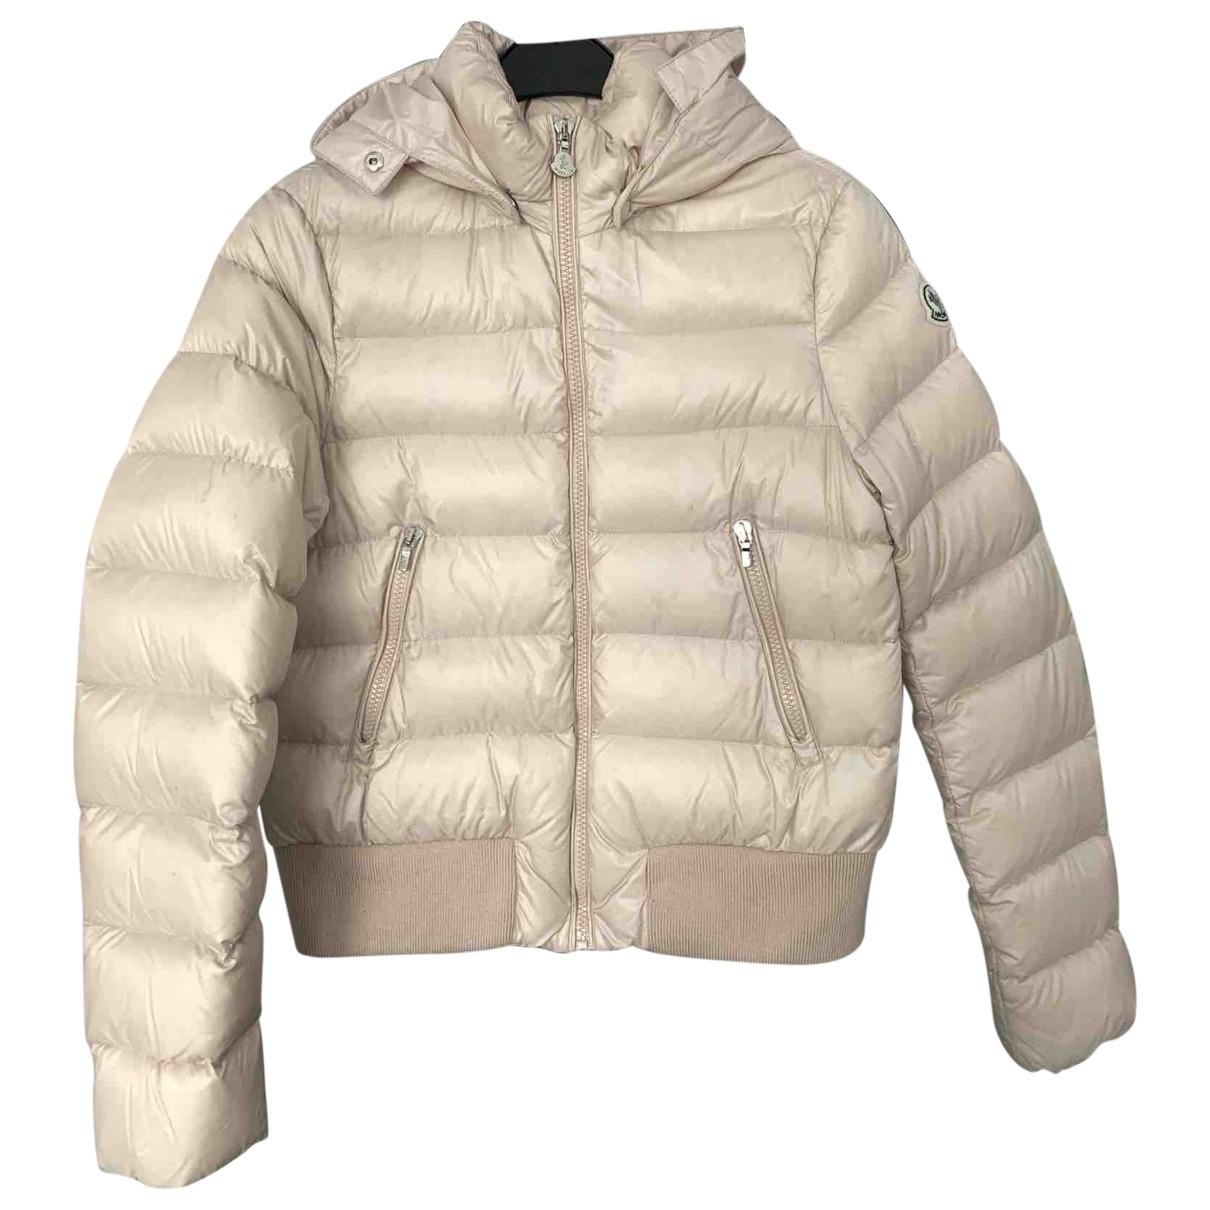 Moncler Hood Pink Silk jacket & coat for Kids 14 years - S UK